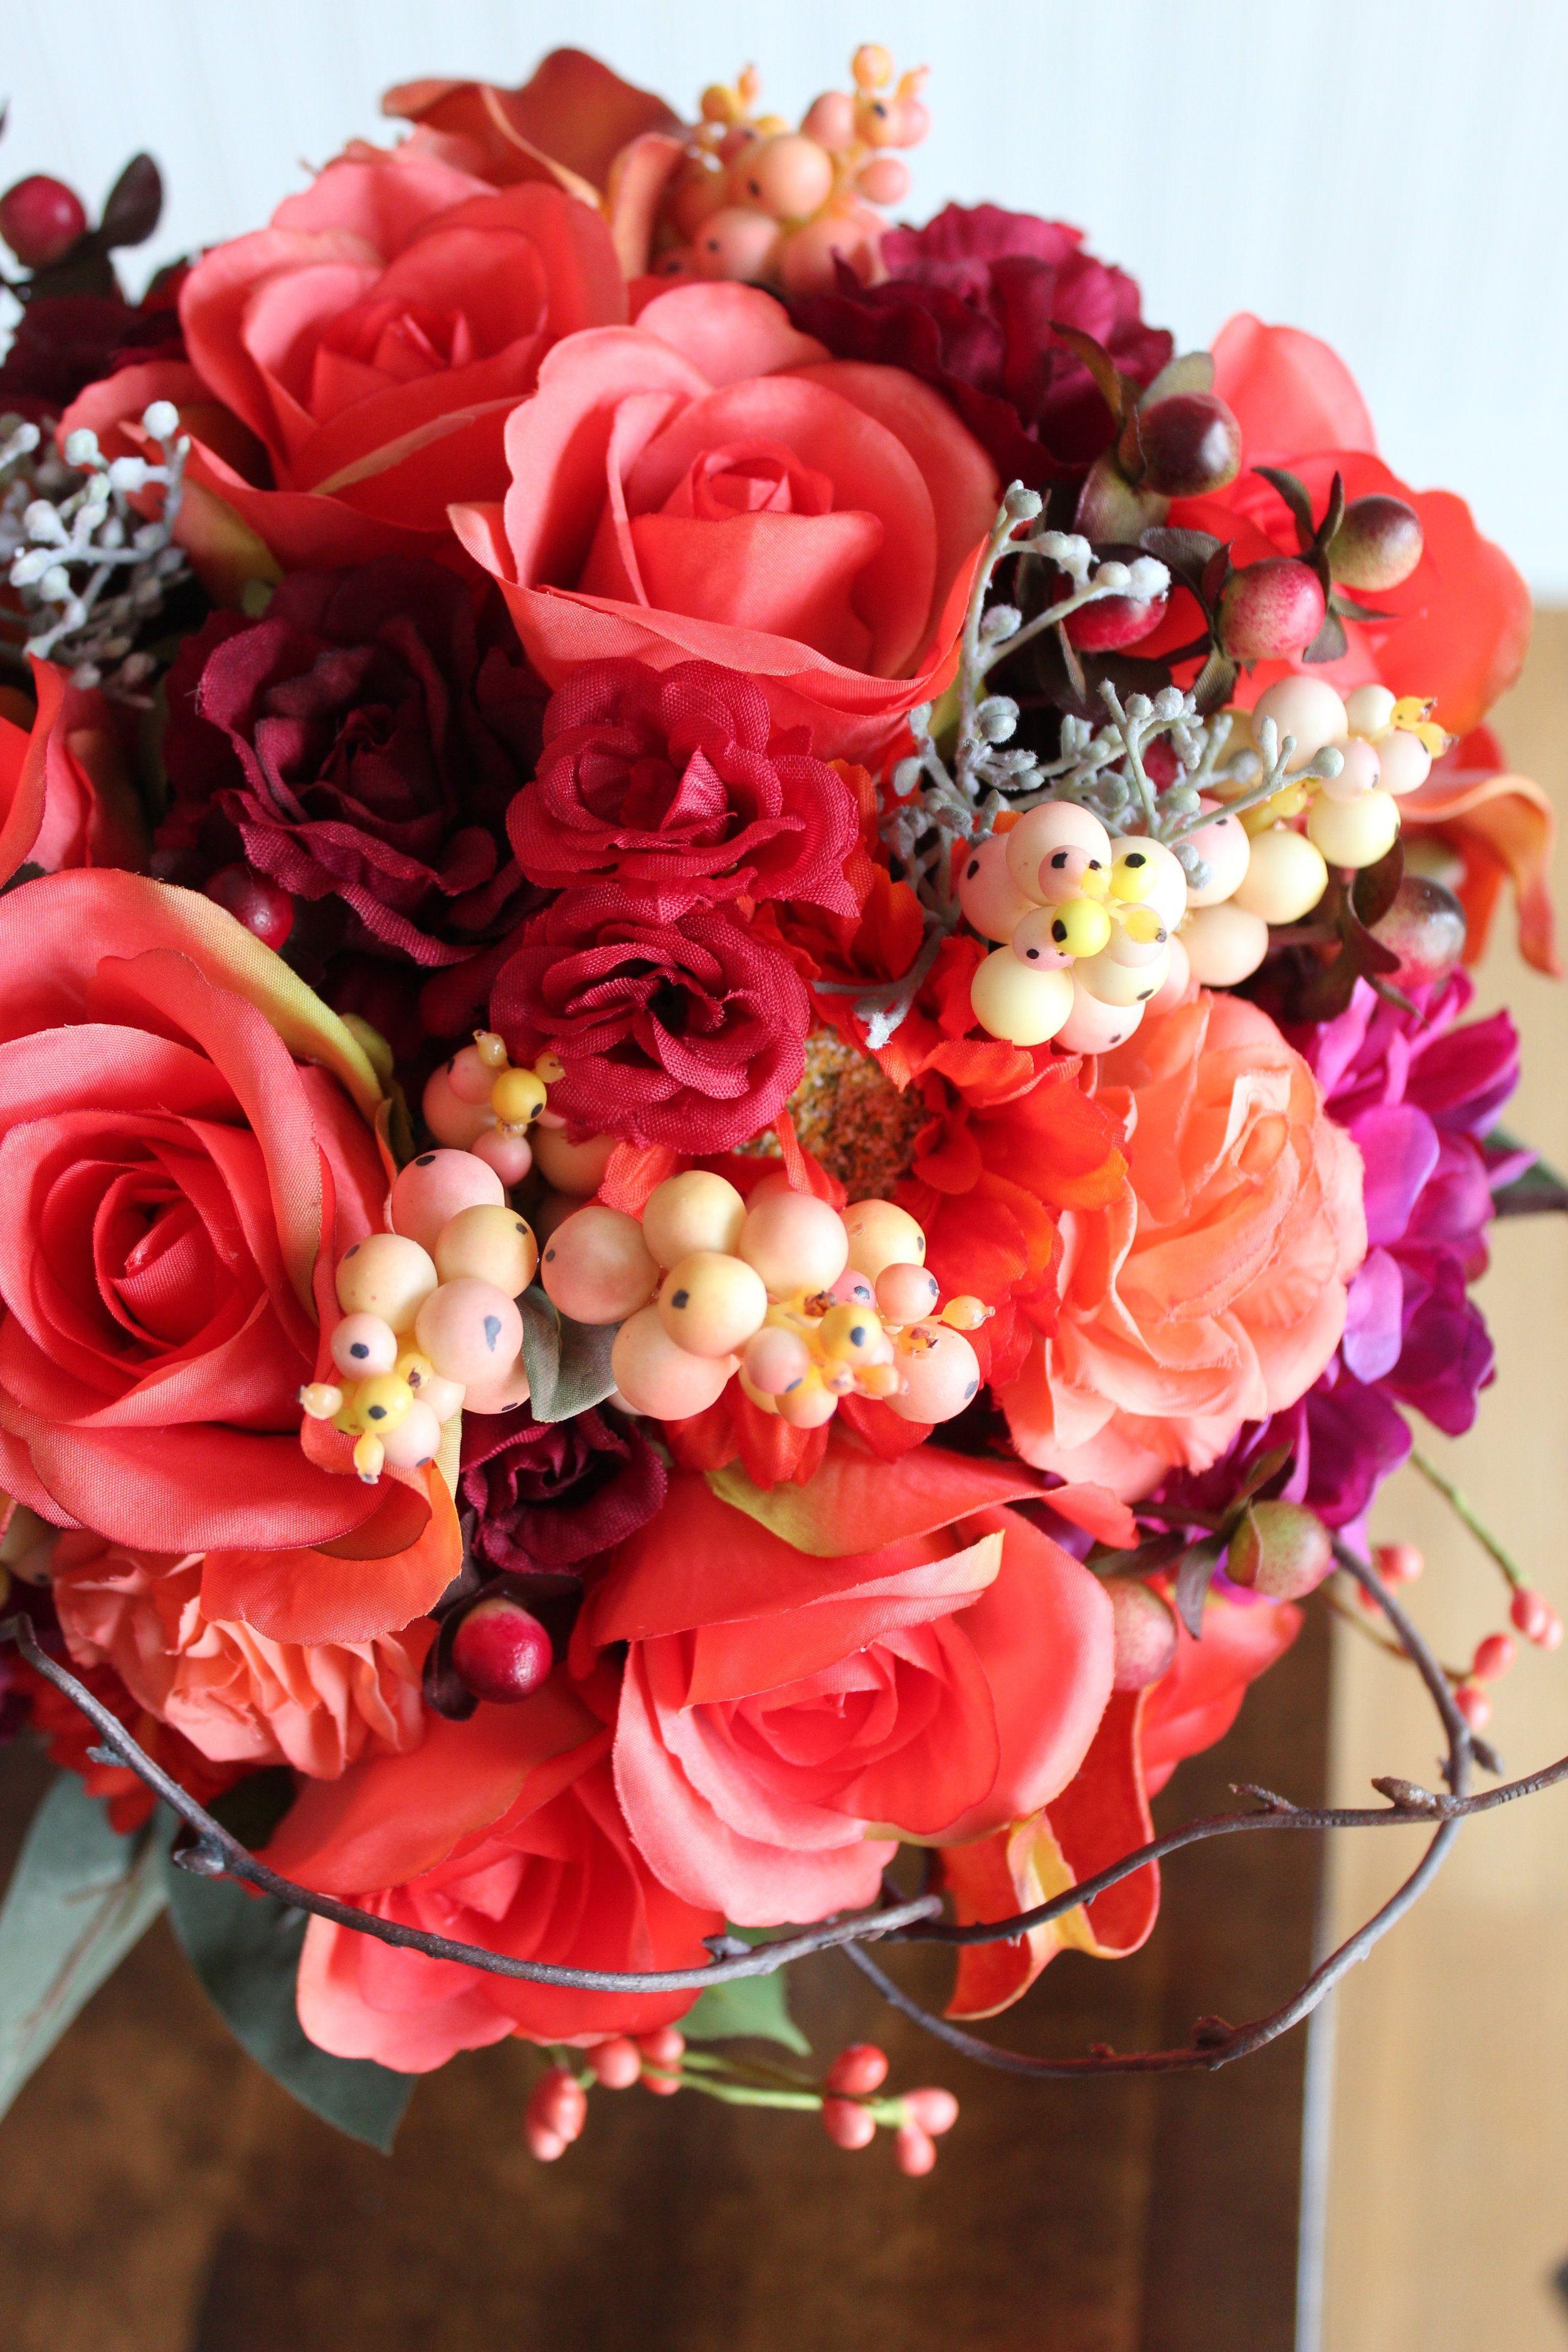 Fall Flowers in a Bridal Bouquet Recreation in Silk